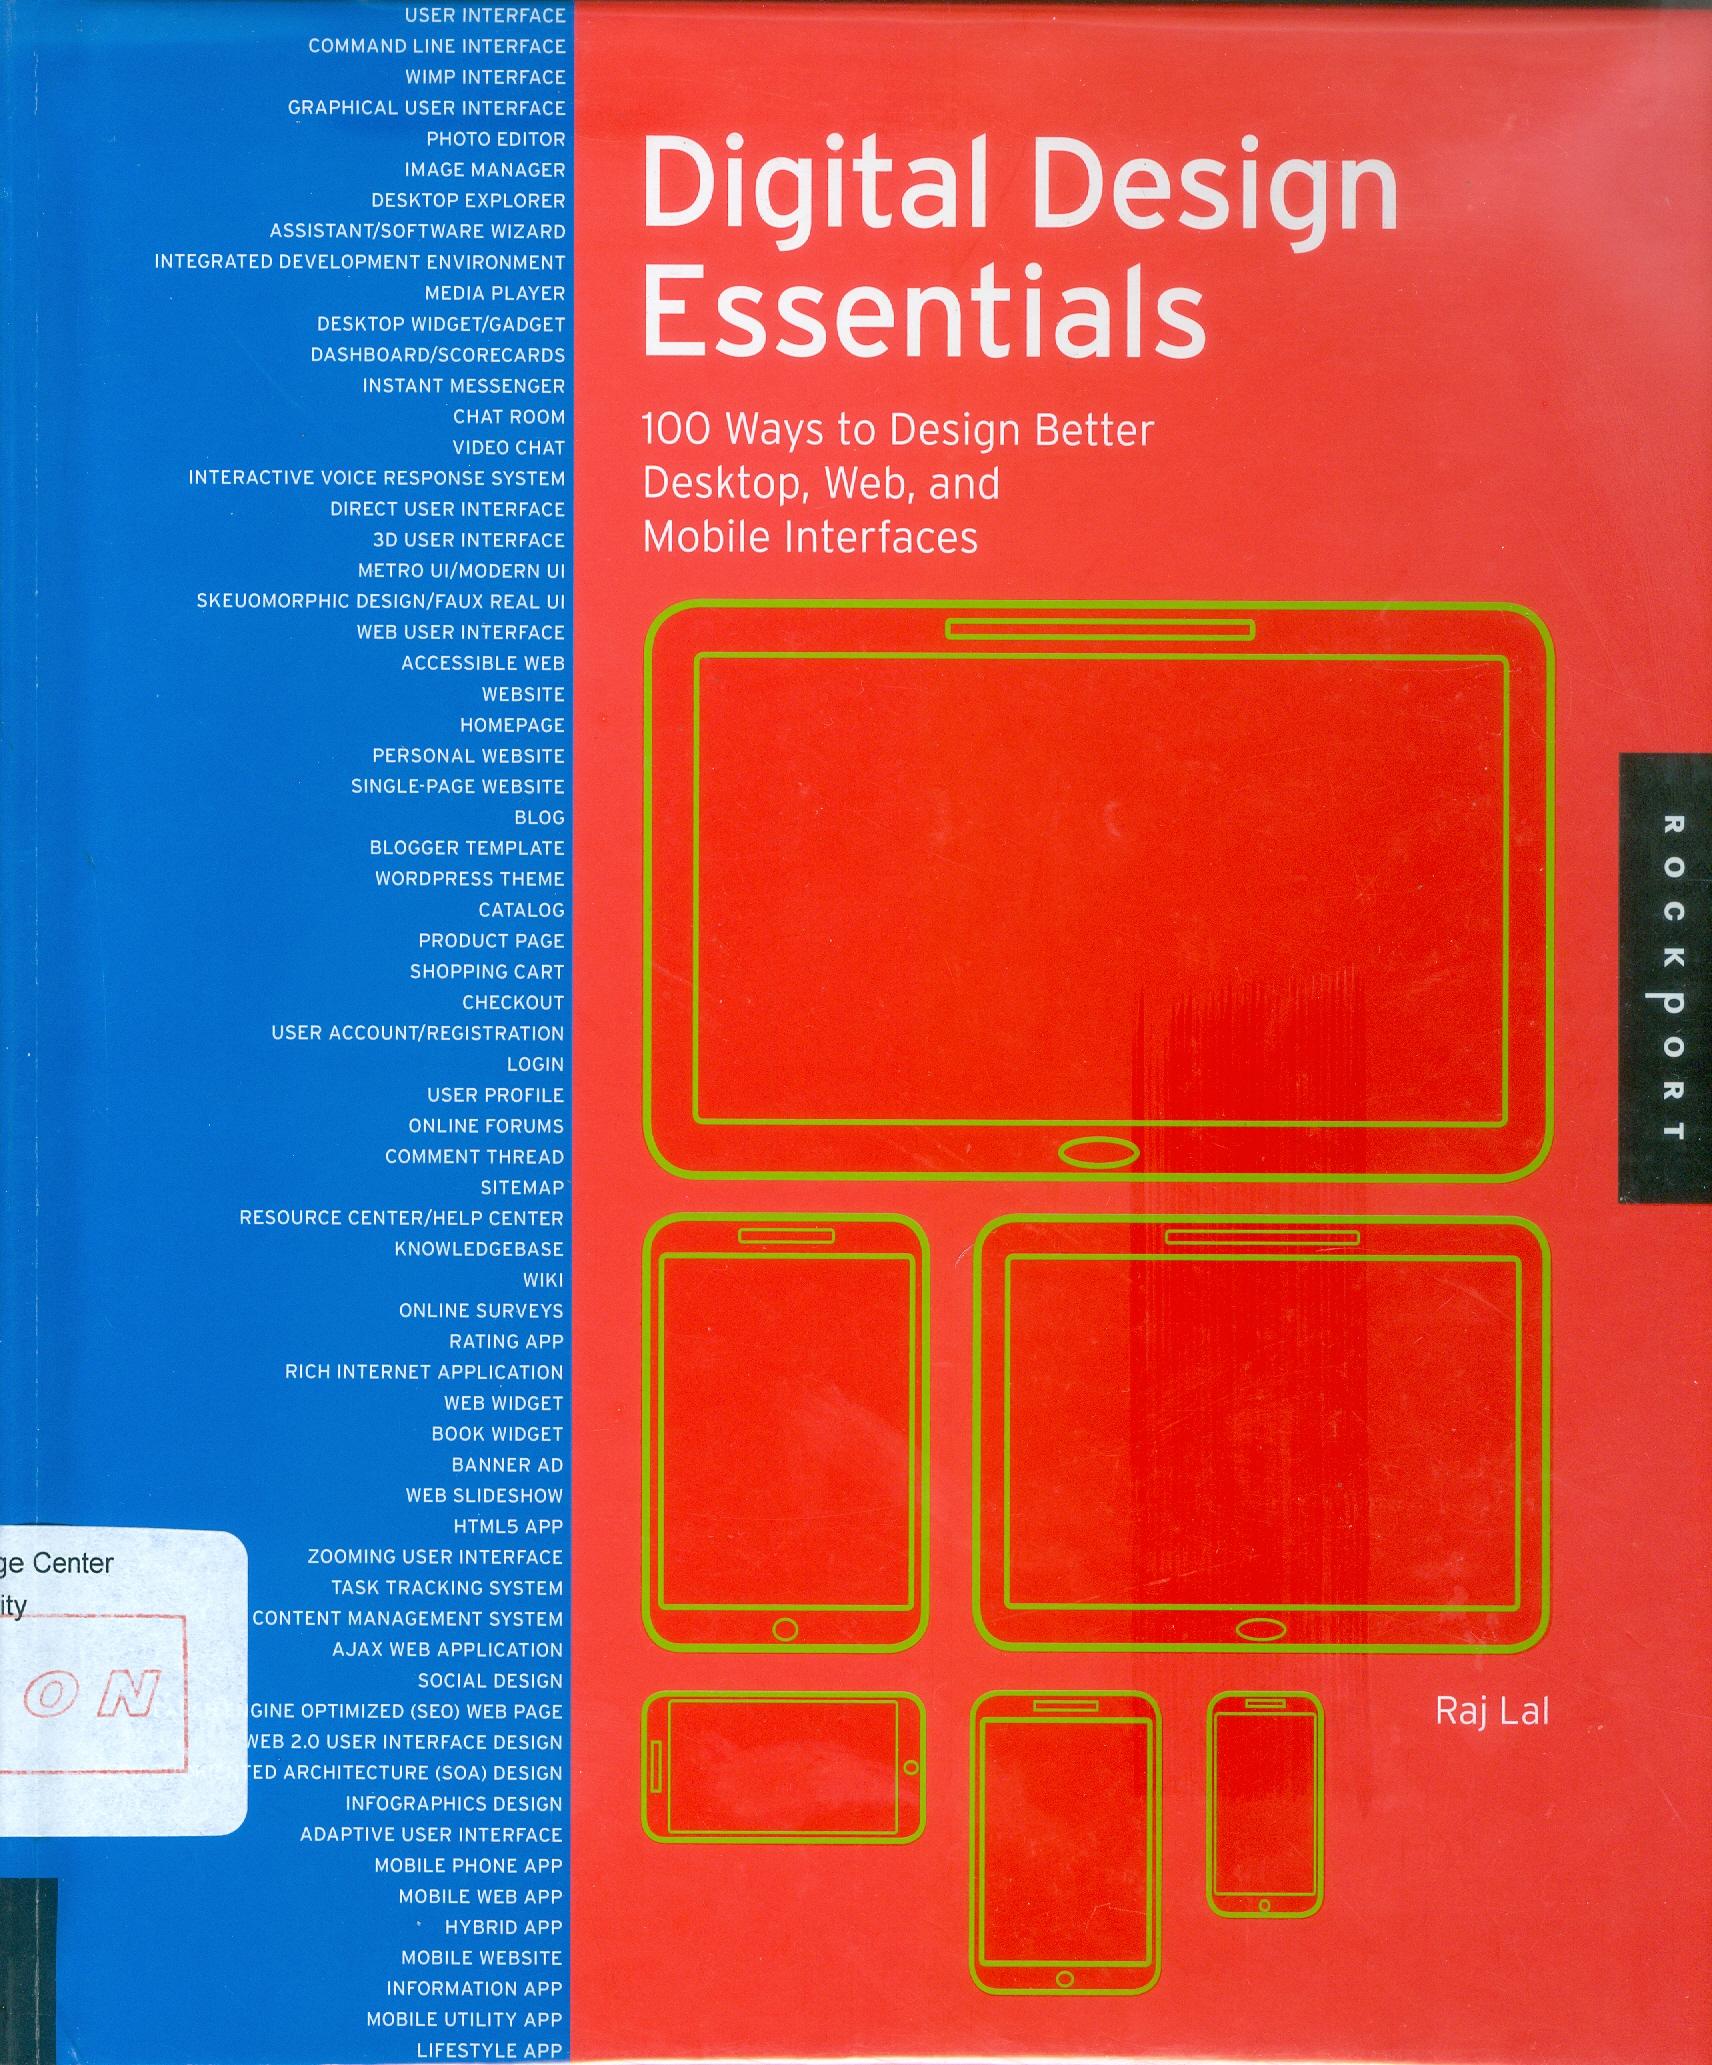 Digital Design Essentials0001.jpg